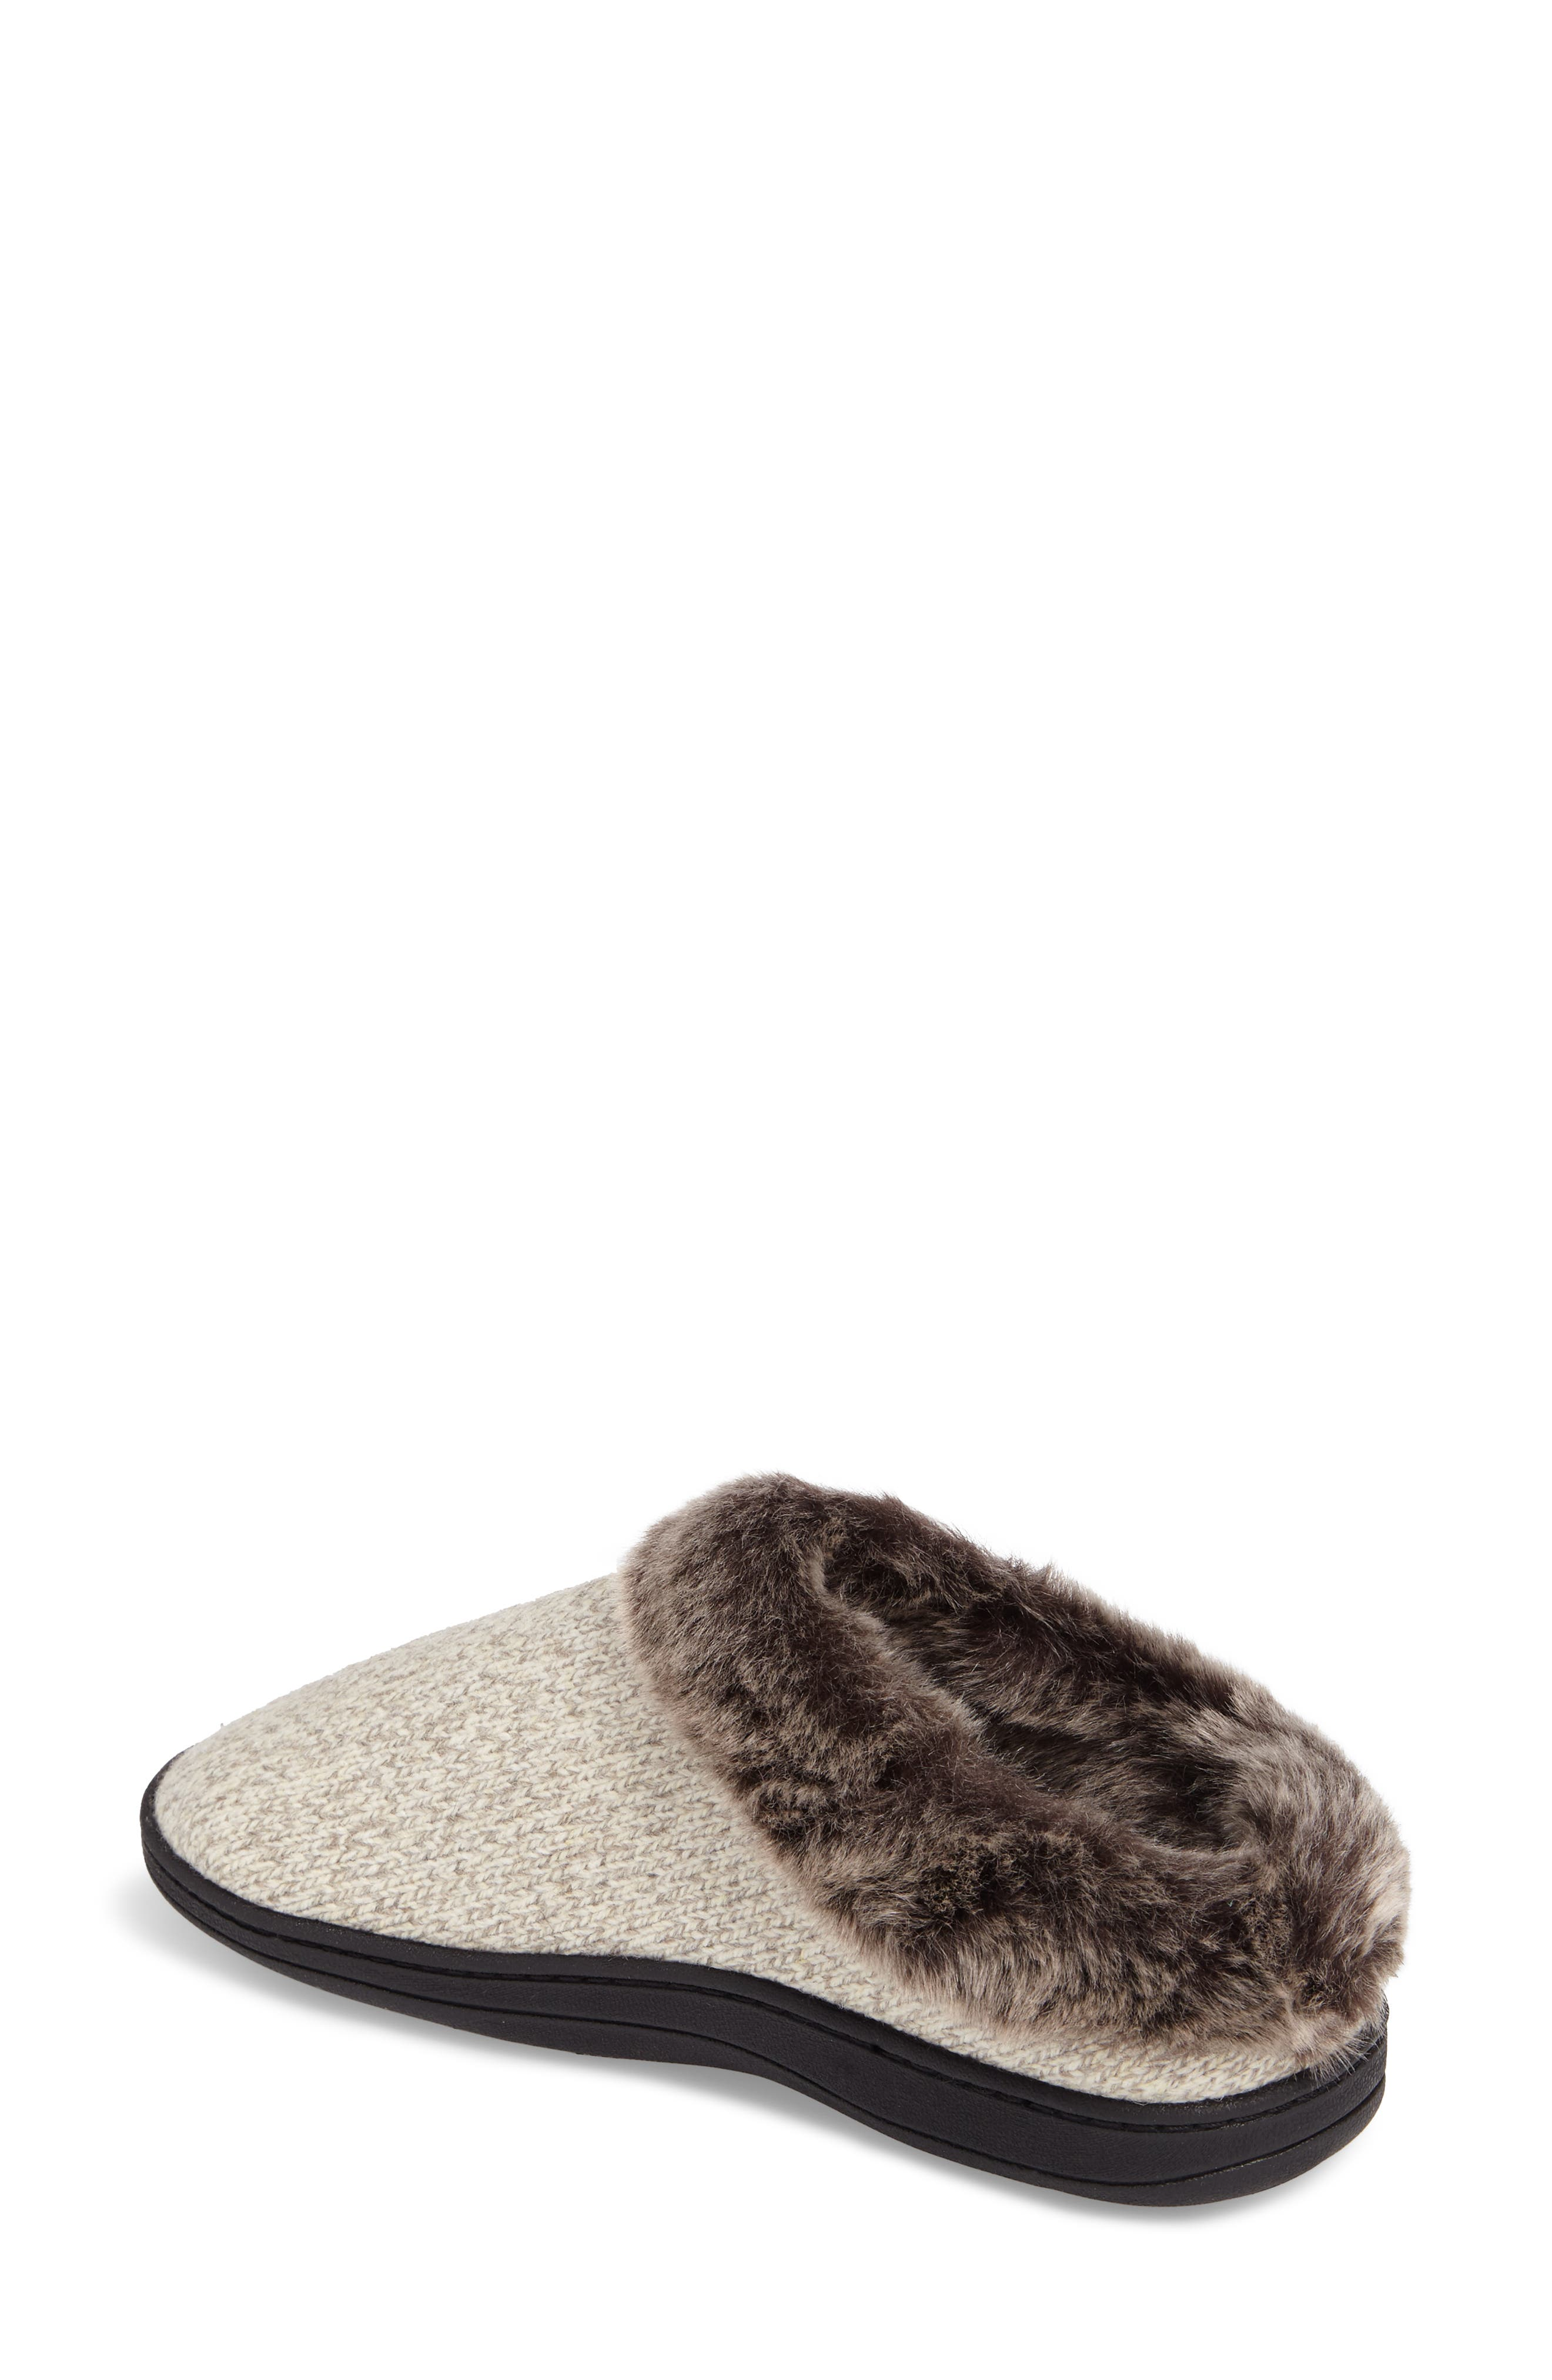 ACORN, Chinchilla Faux Fur Slipper, Alternate thumbnail 2, color, CHARCOAL HEATHER